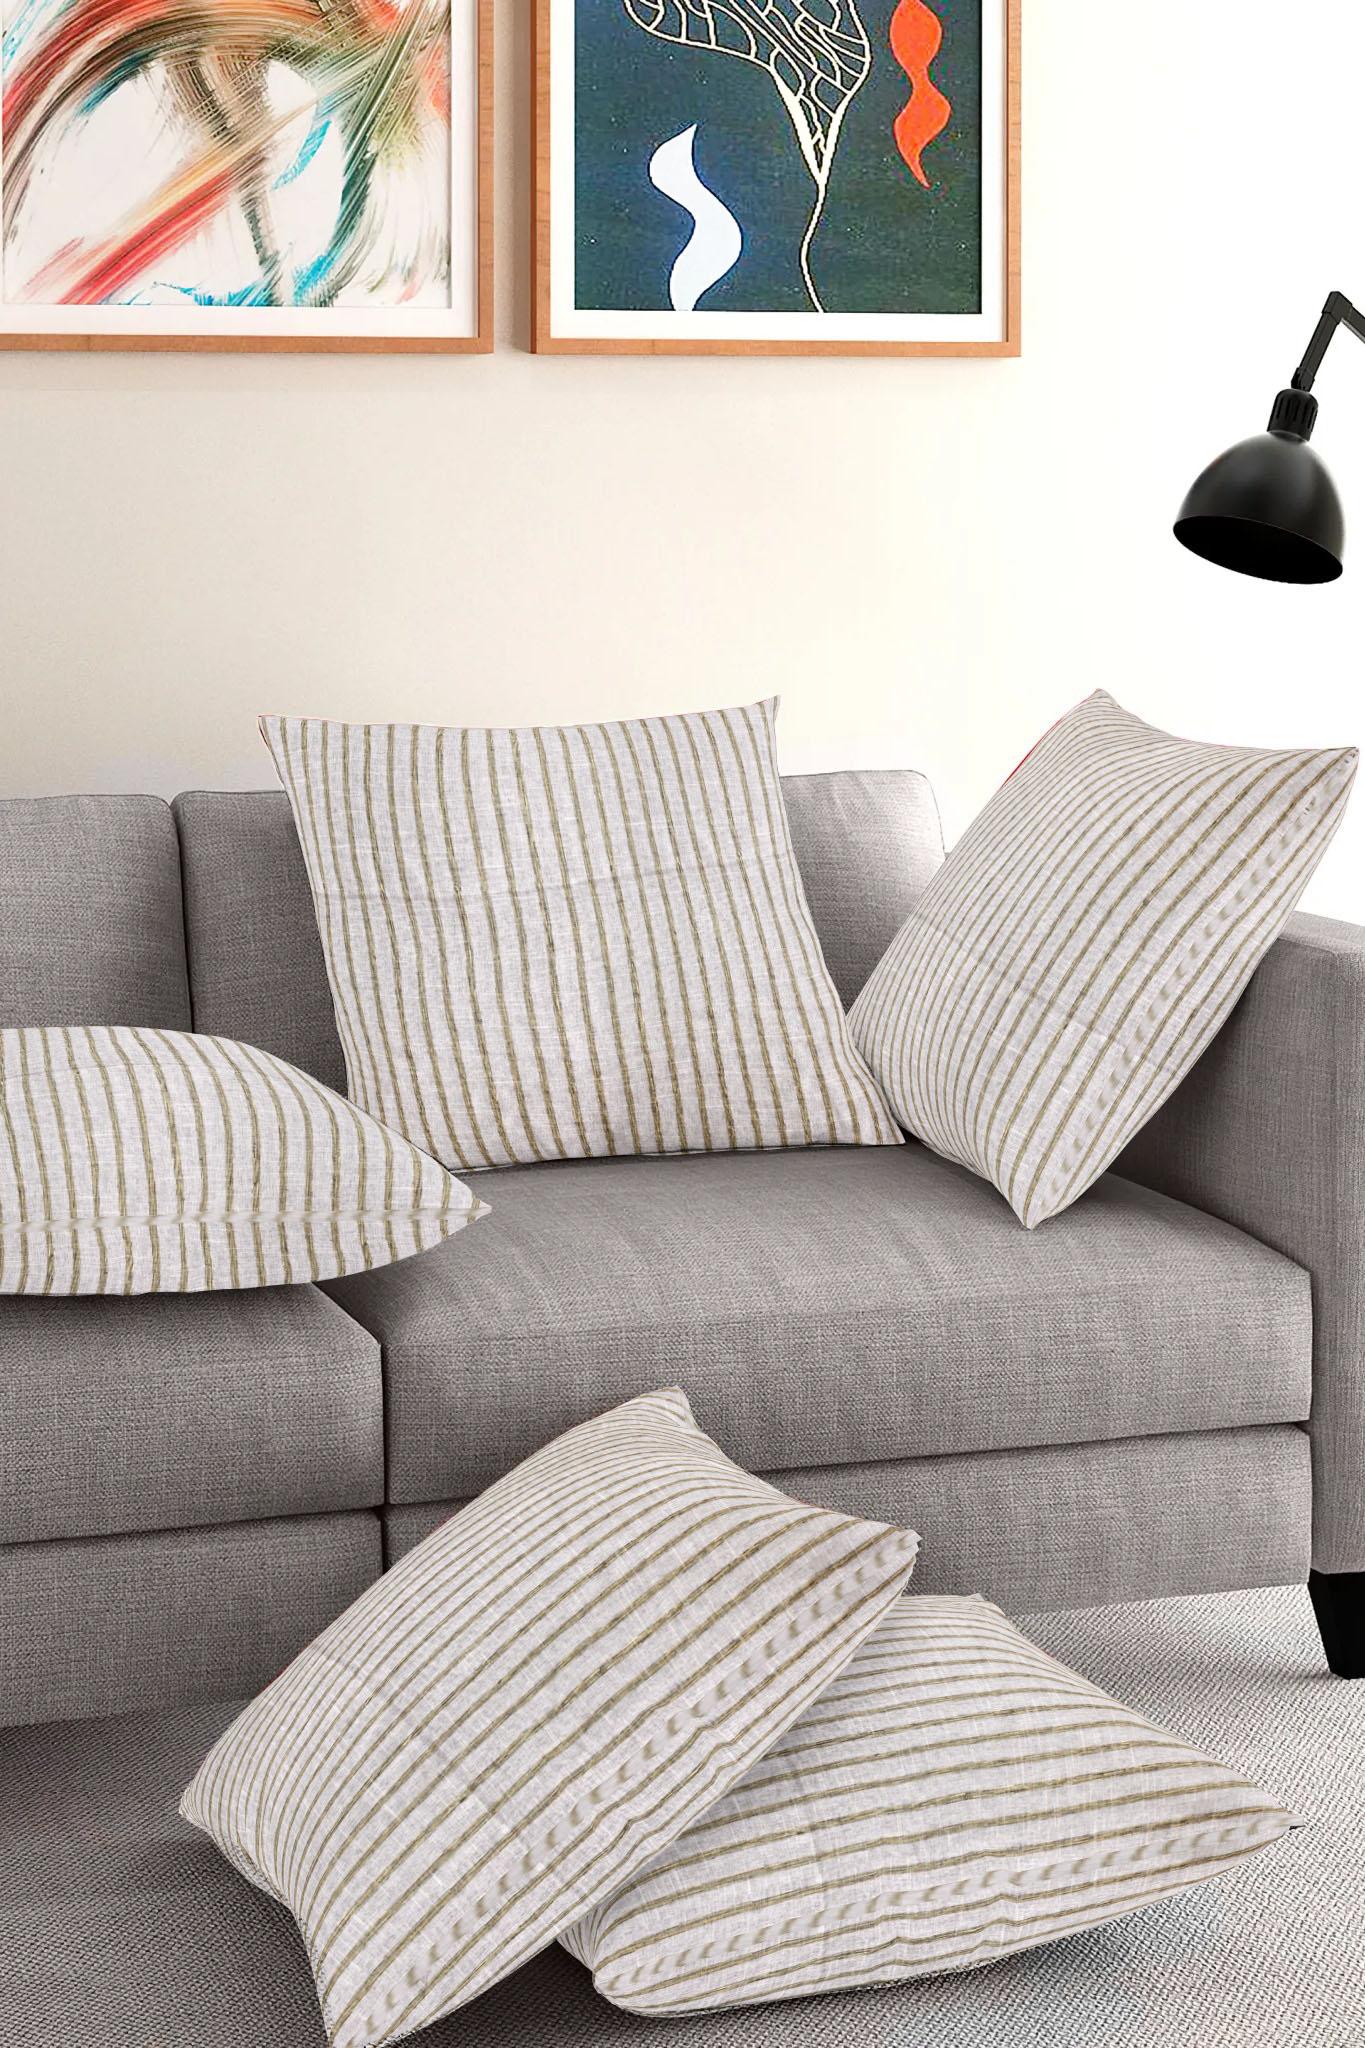 /home/customer/www/fabartcraft.com/public_html/uploadshttps://www.shopolics.com/uploads/images/medium/White-Brown-Cotton-Cushion-Cover-35405.jpg